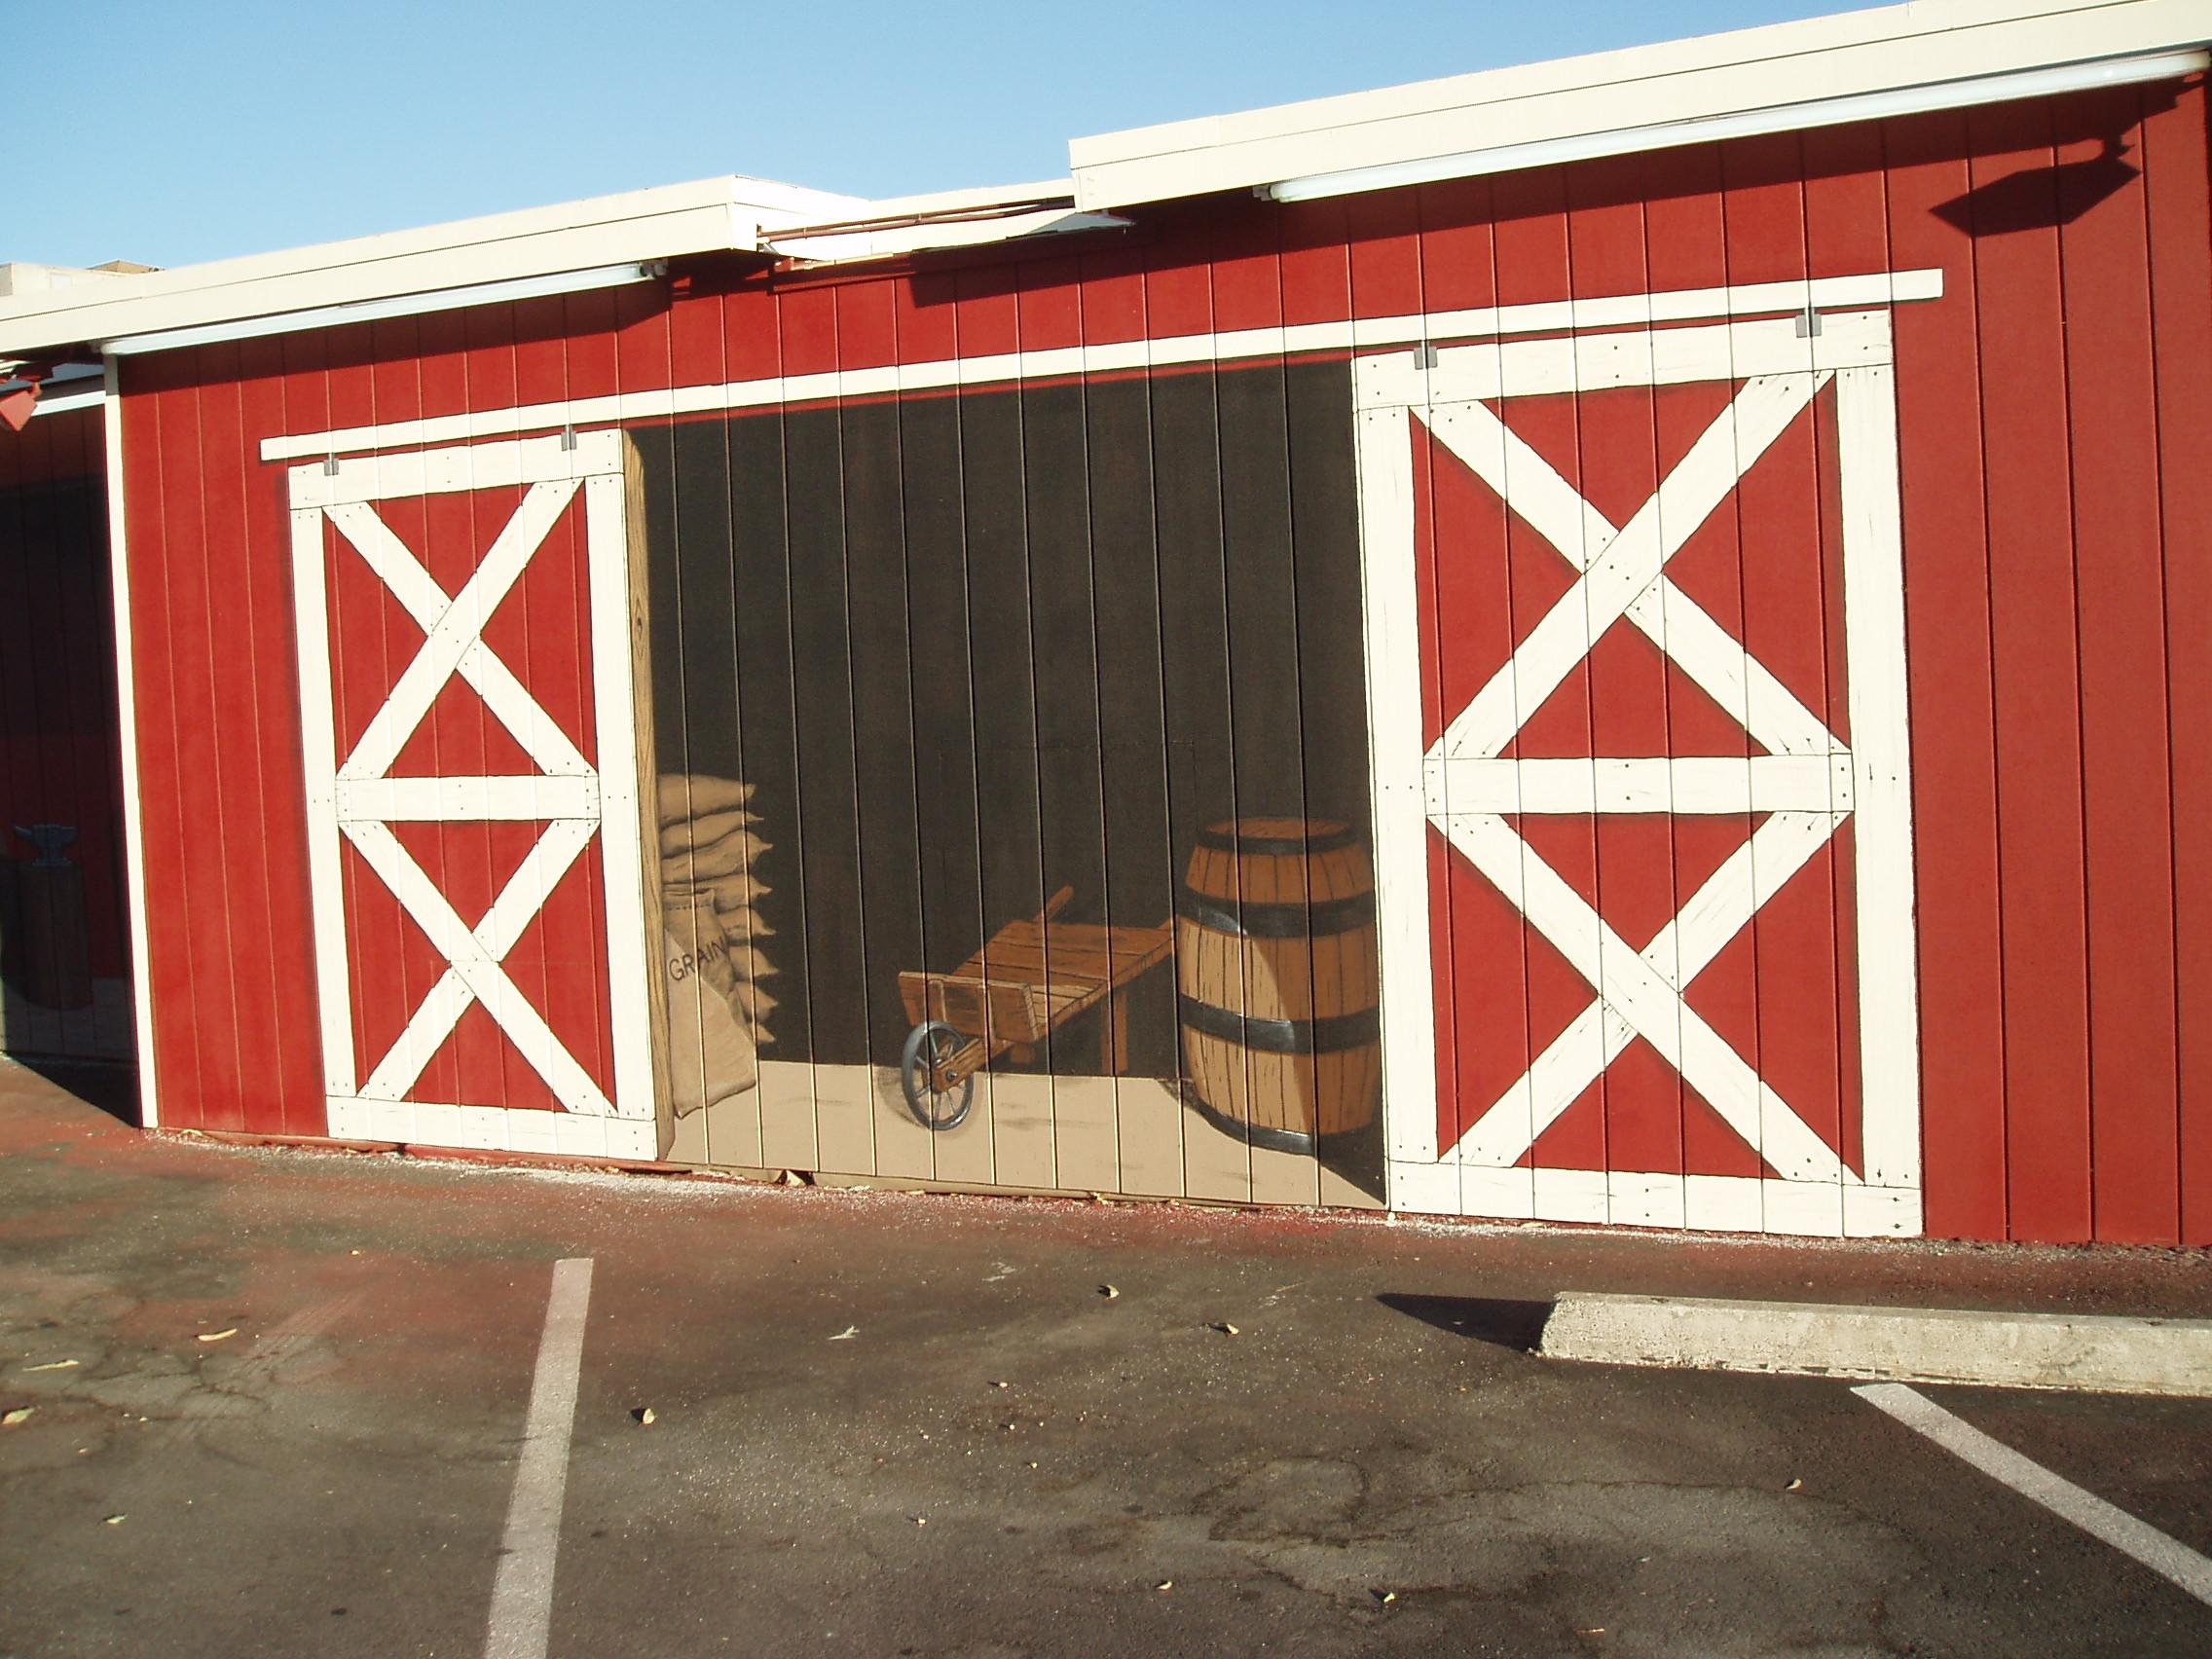 Western Mural Wagon Wheel Restaurant exterior Santee California 13.JPG